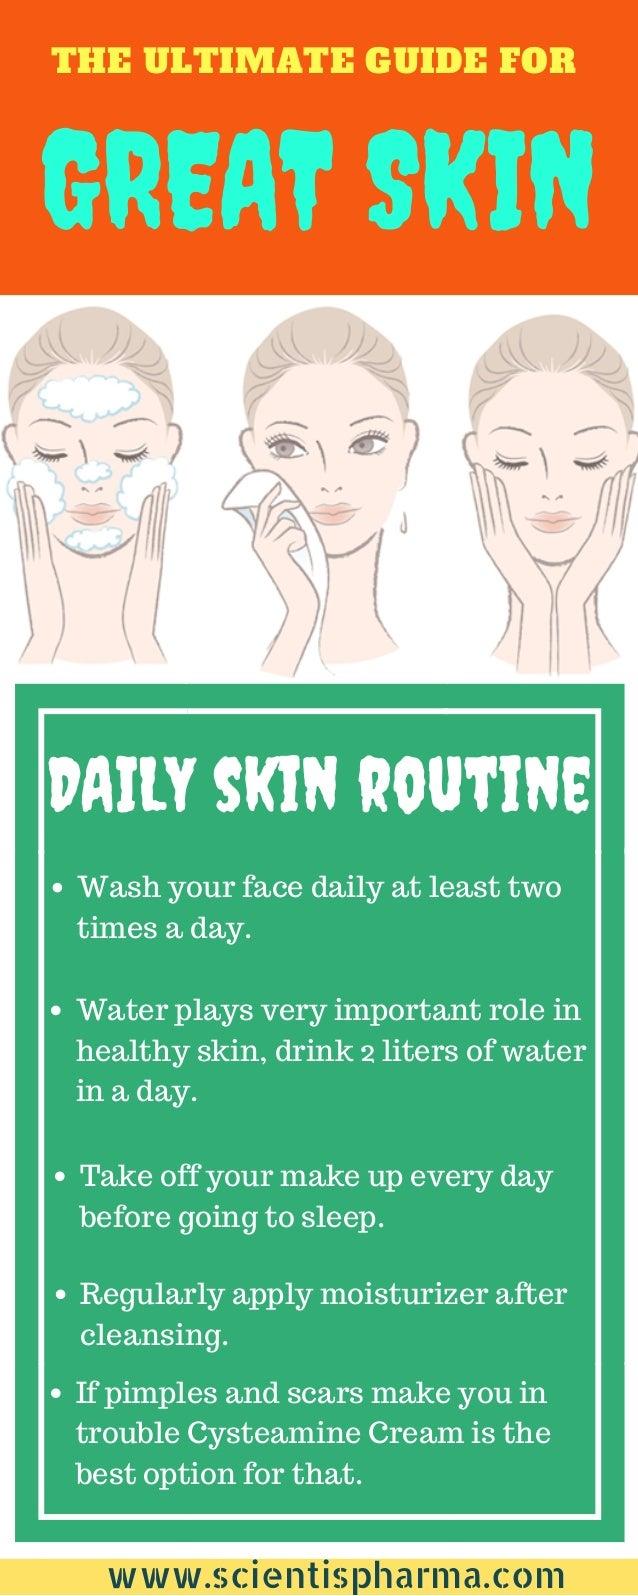 Great skin tips